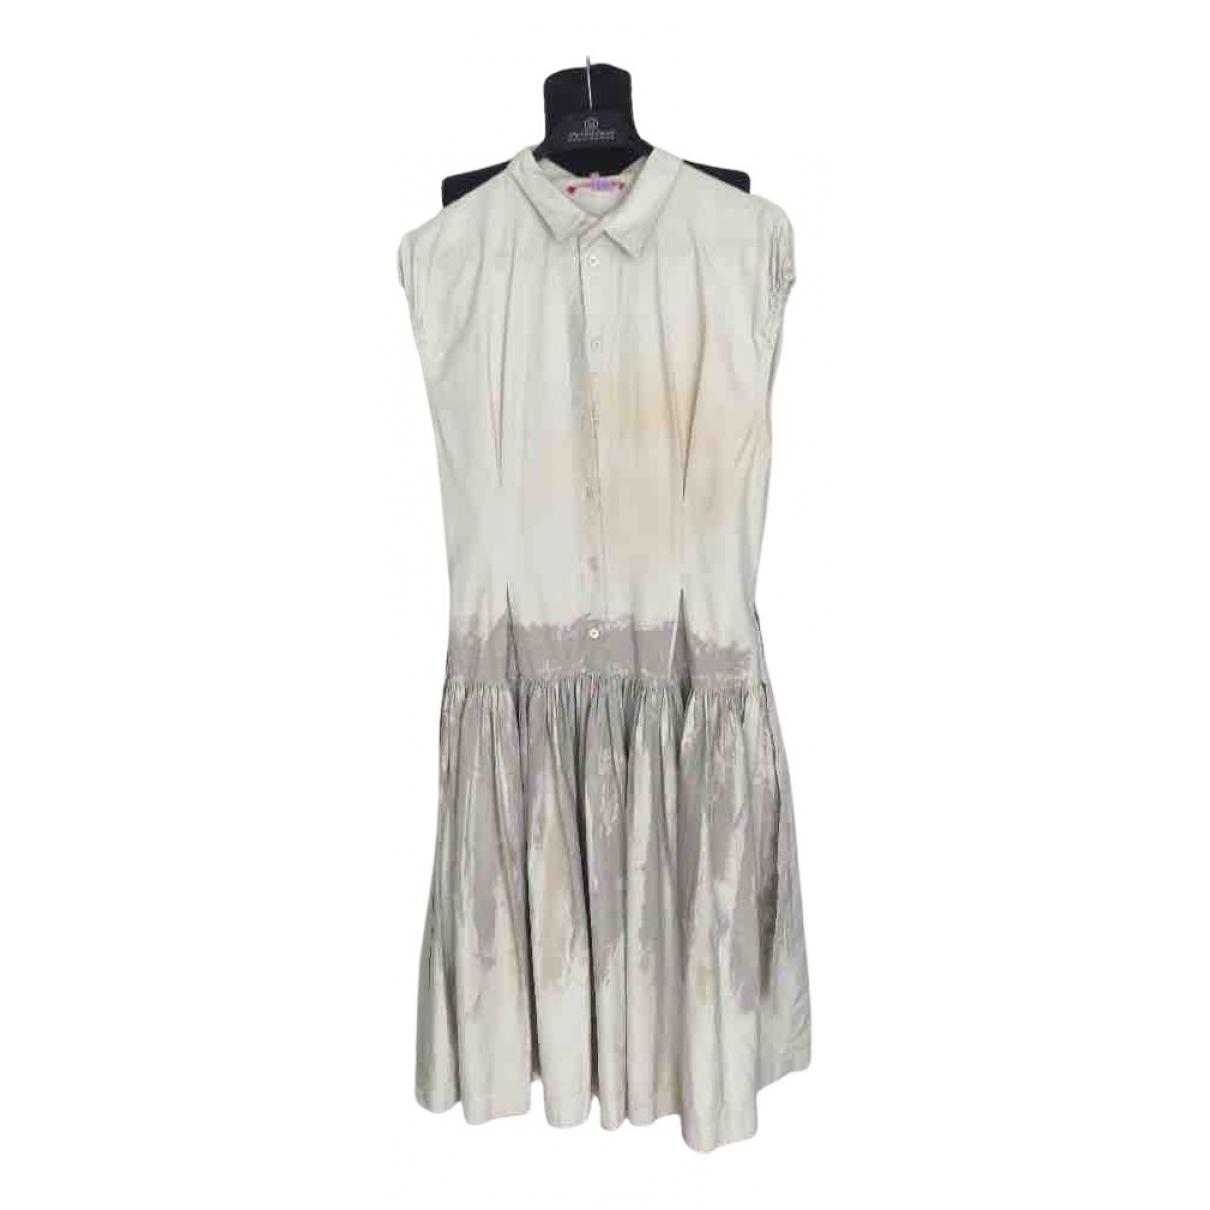 Prada \N Beige Cotton dress for Women M International